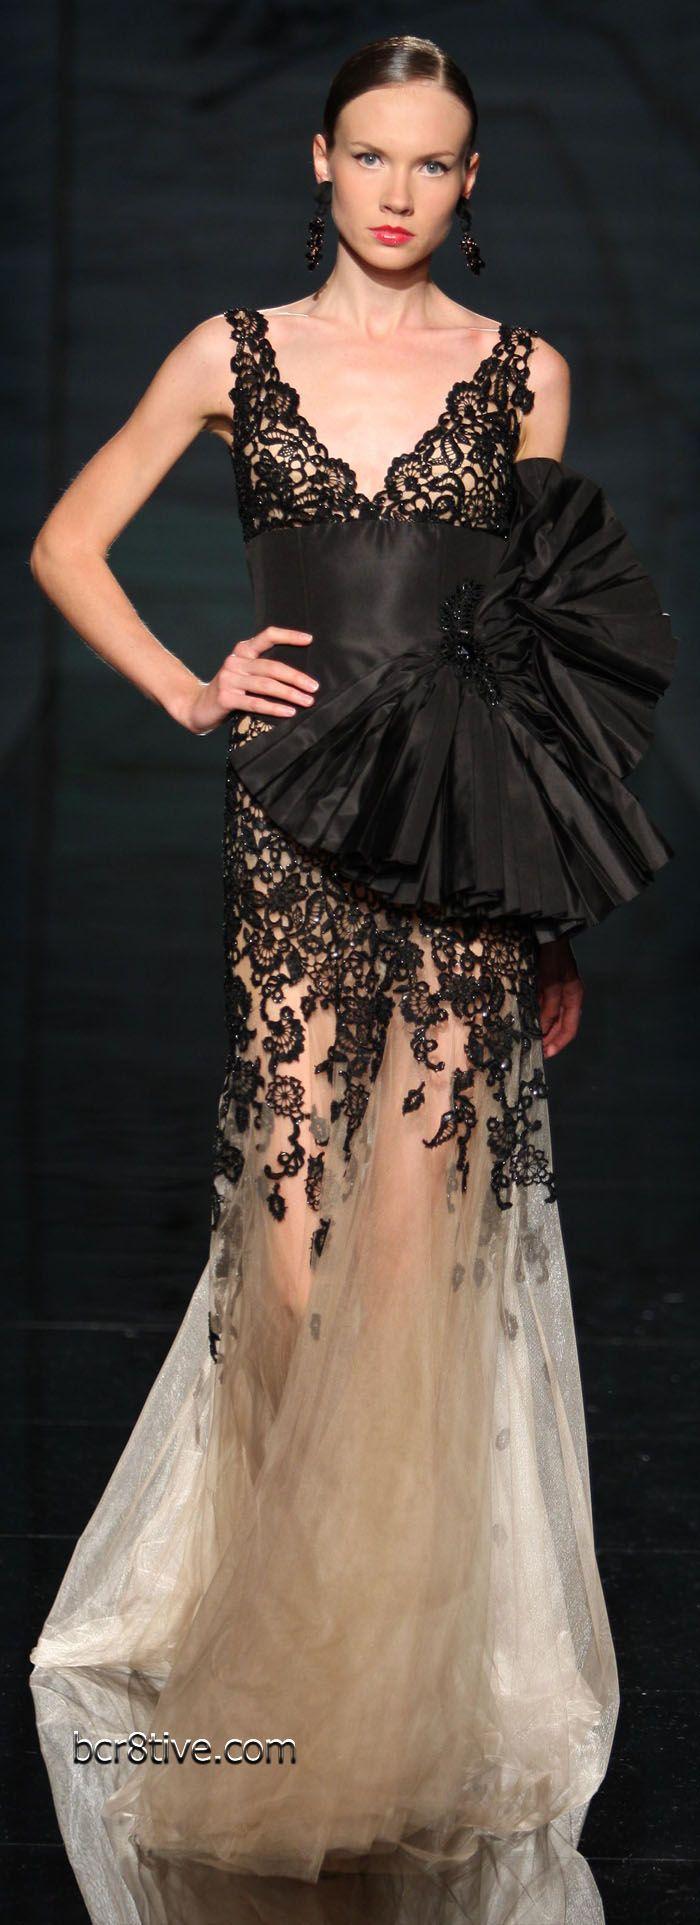 #Fausto Sarli Couture